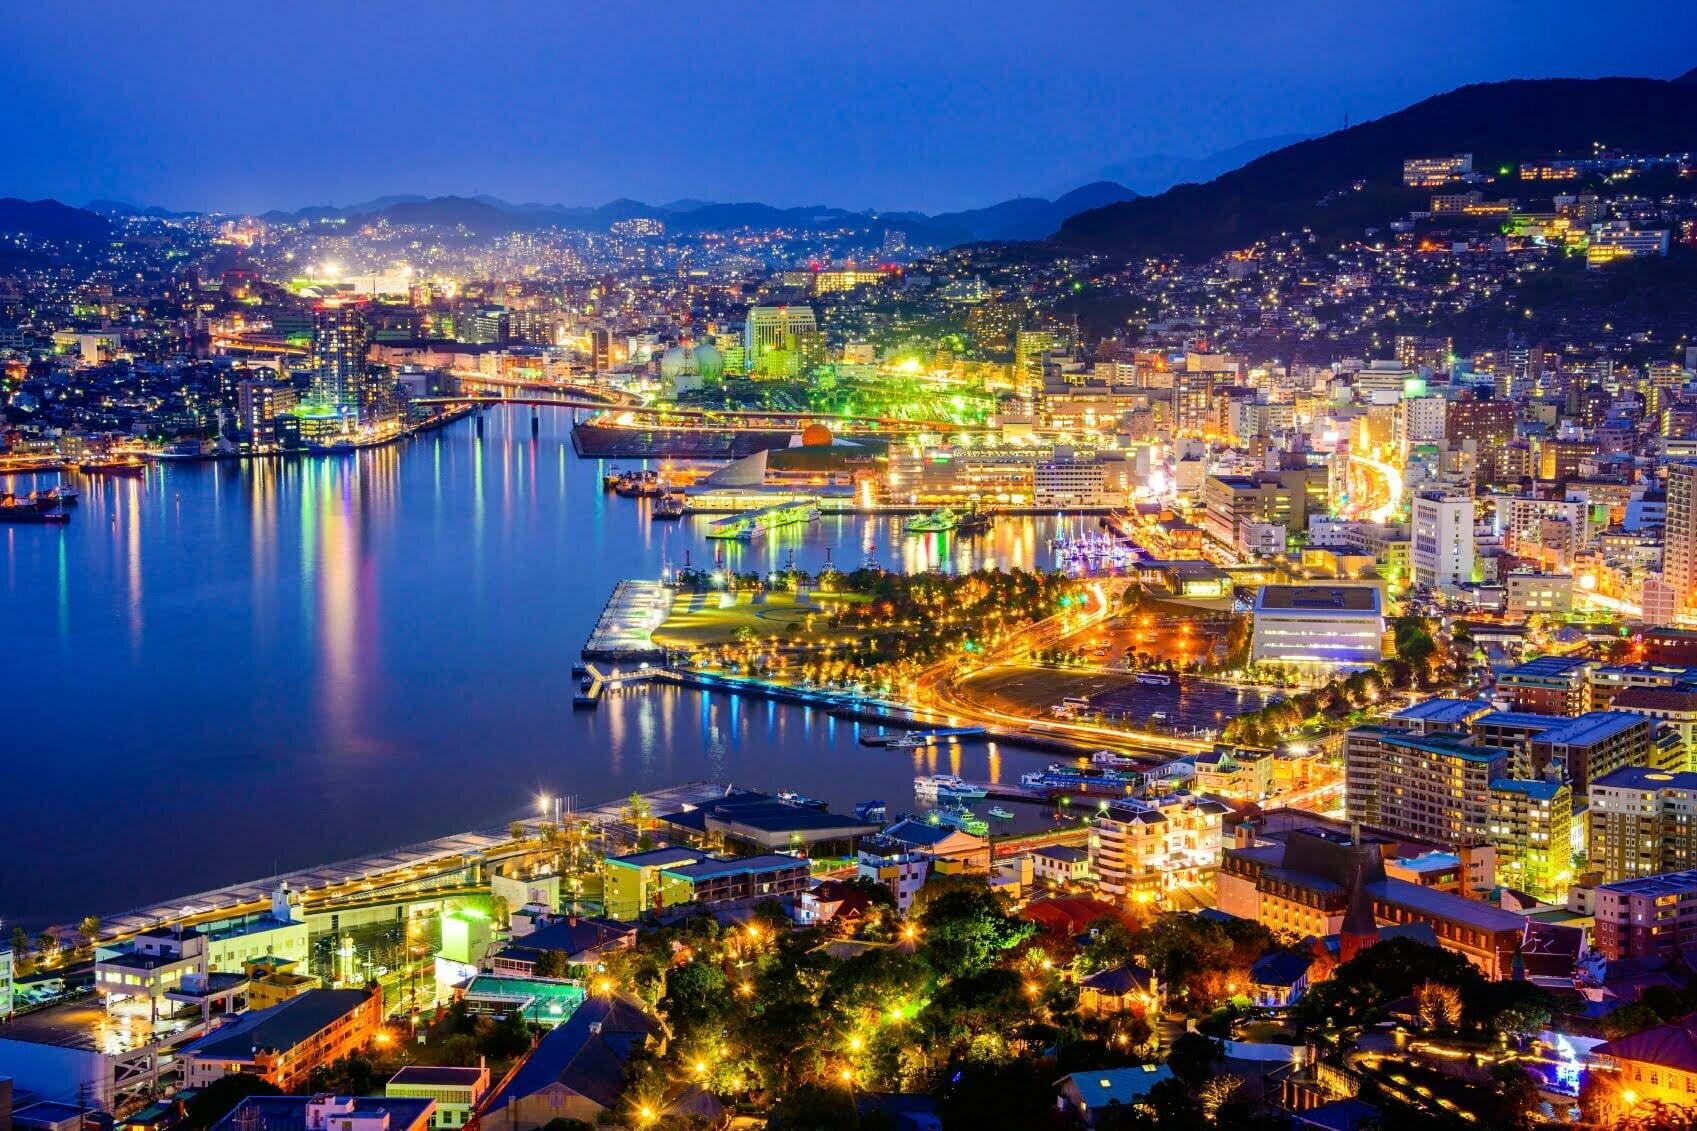 Japan's Nagasaki Announce Expected January IR Launch